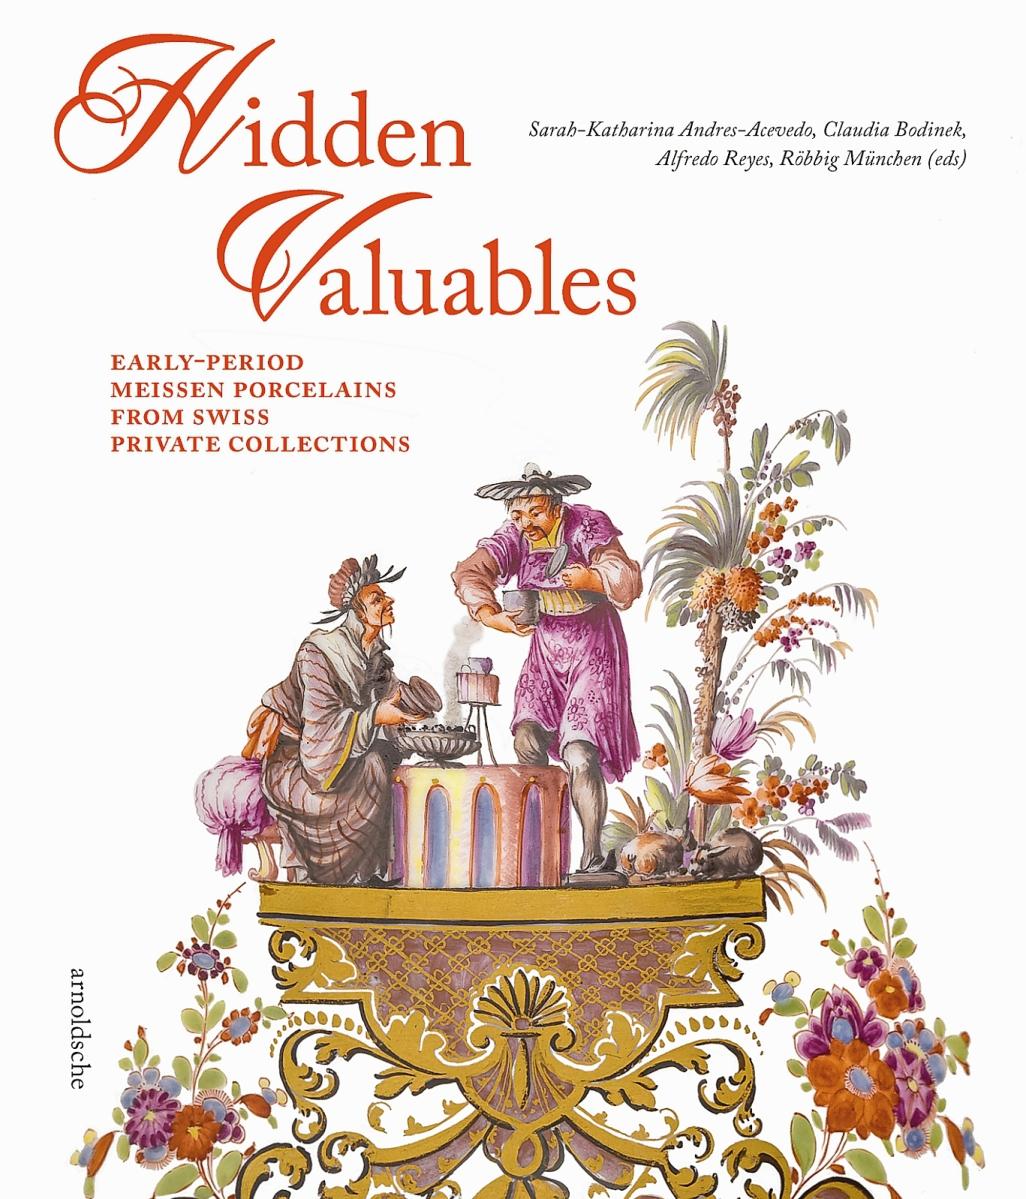 596-3_HiddenValuables_Cover